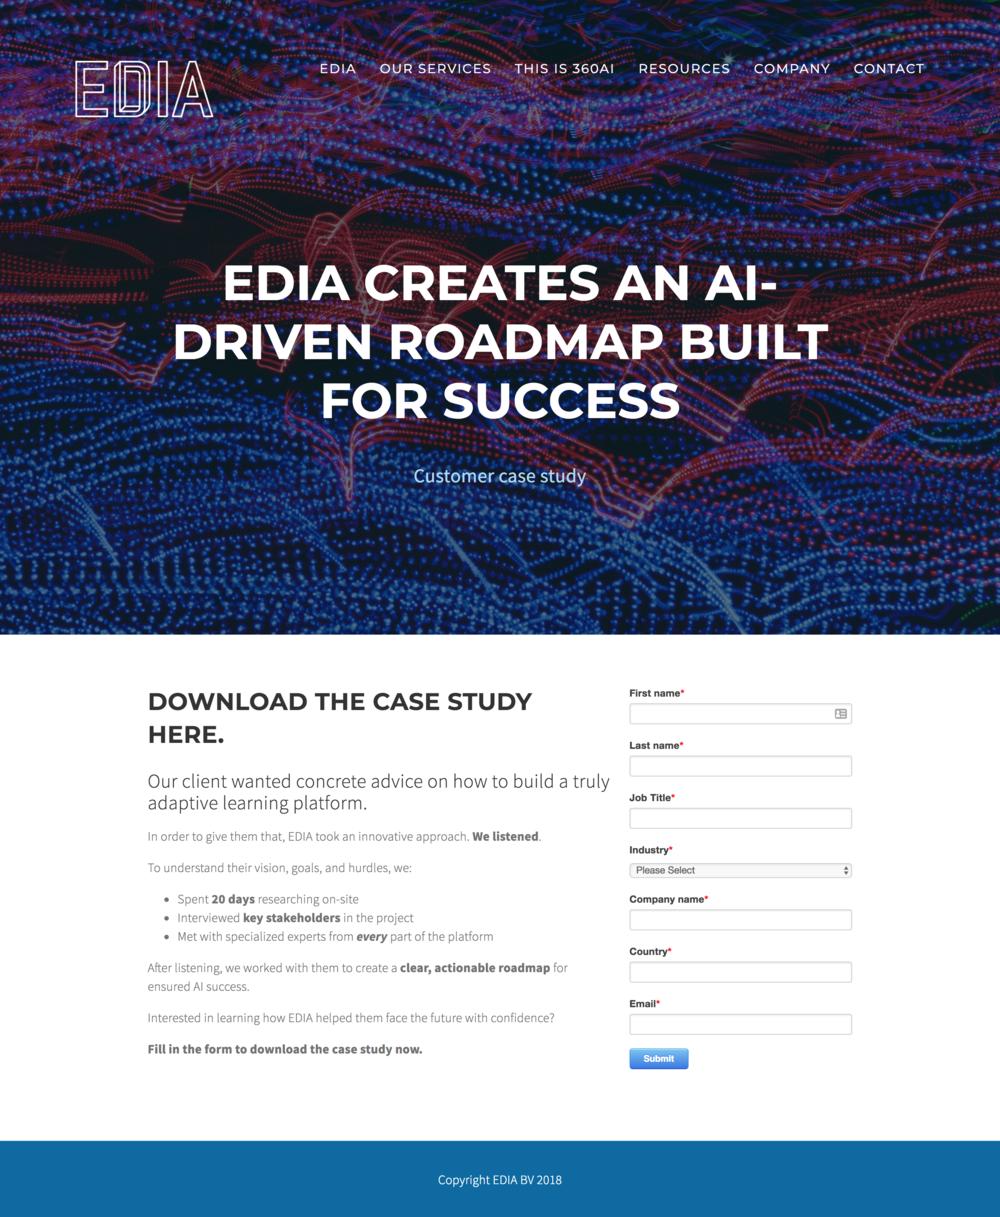 screencapture-info-edia-nl-download-customer-case-study-4-2018-07-25-20_35_07.png